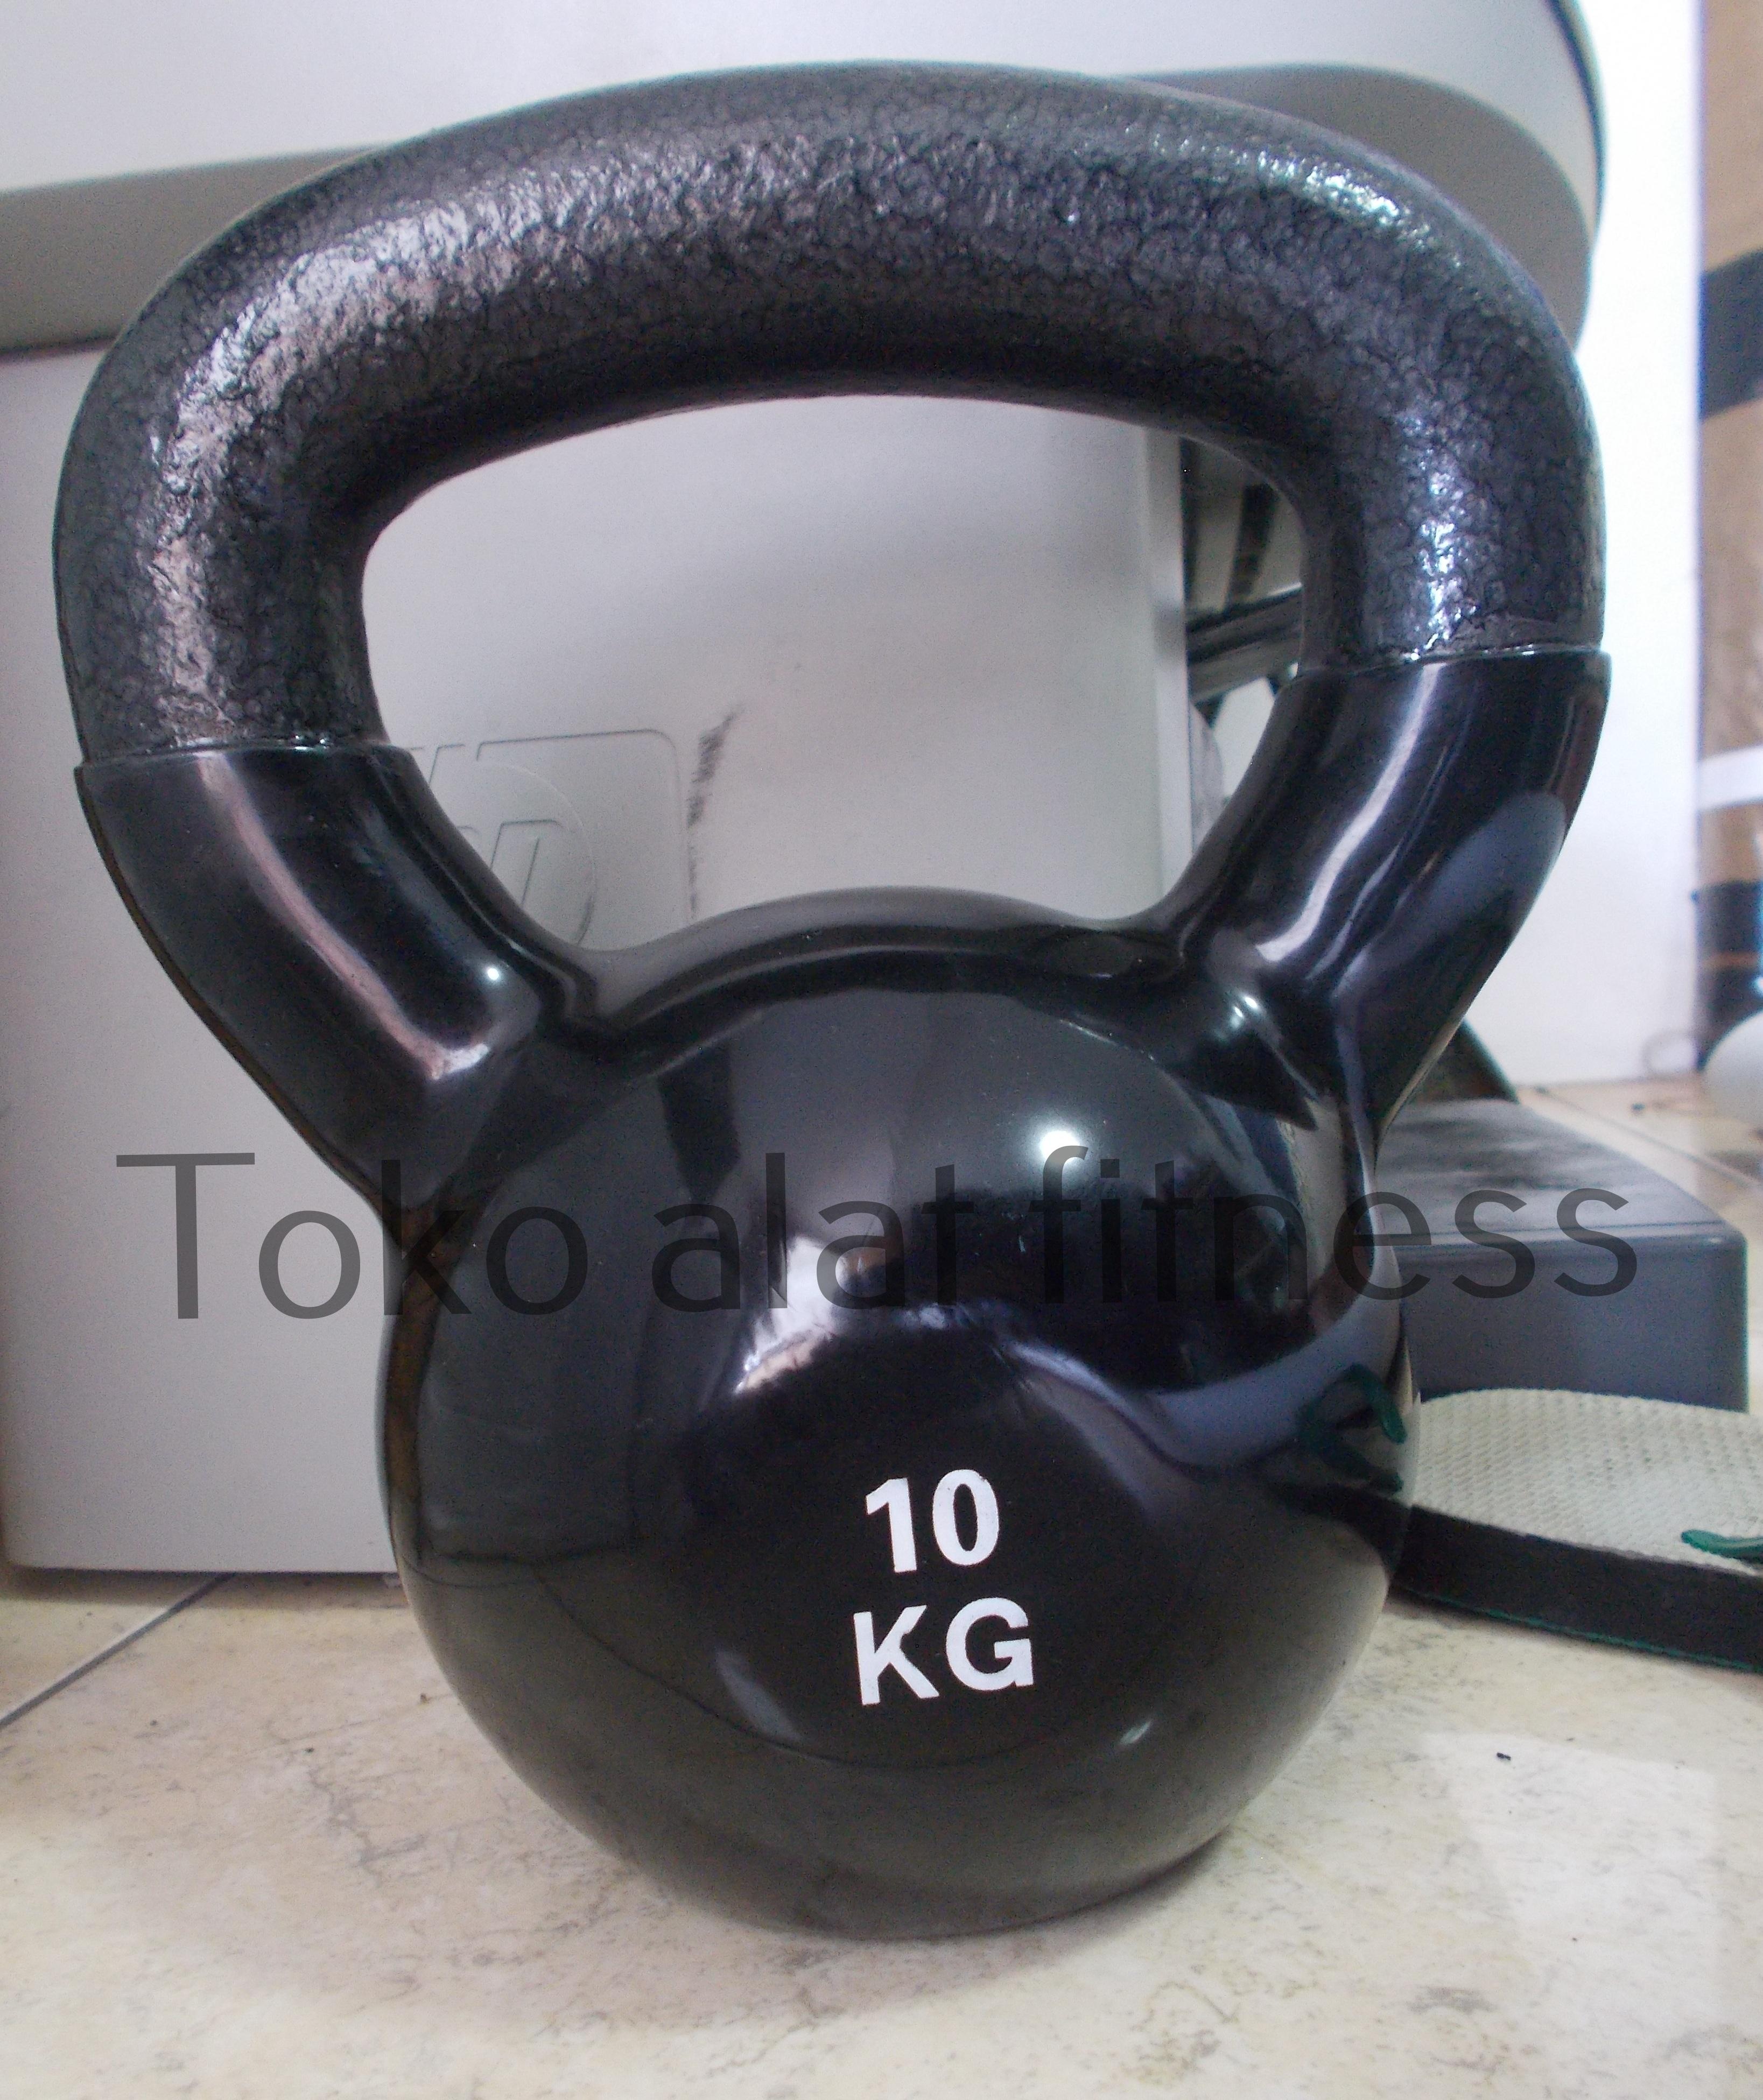 Kettlebell Vynil 10kg Body Gym - Kettlebell Vinyl 10kg (Import) Body Gym